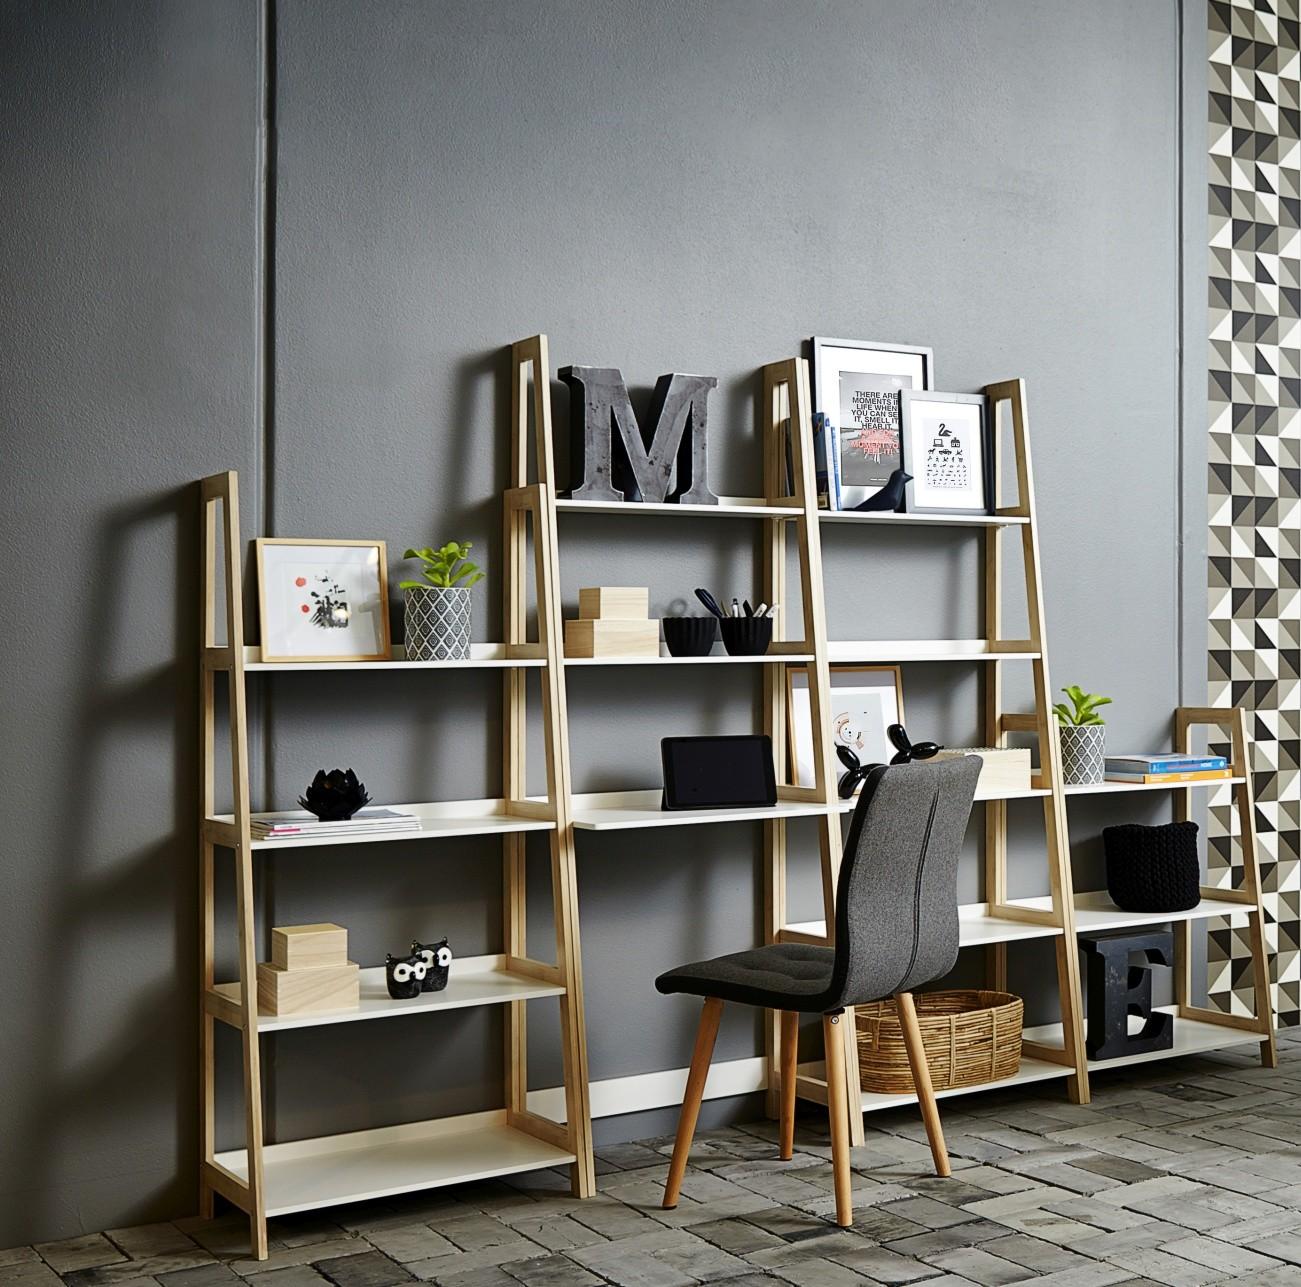 24Designs Wandmeubel Wall - B63 X H95 X D40 Cm - Bamboe - Wit